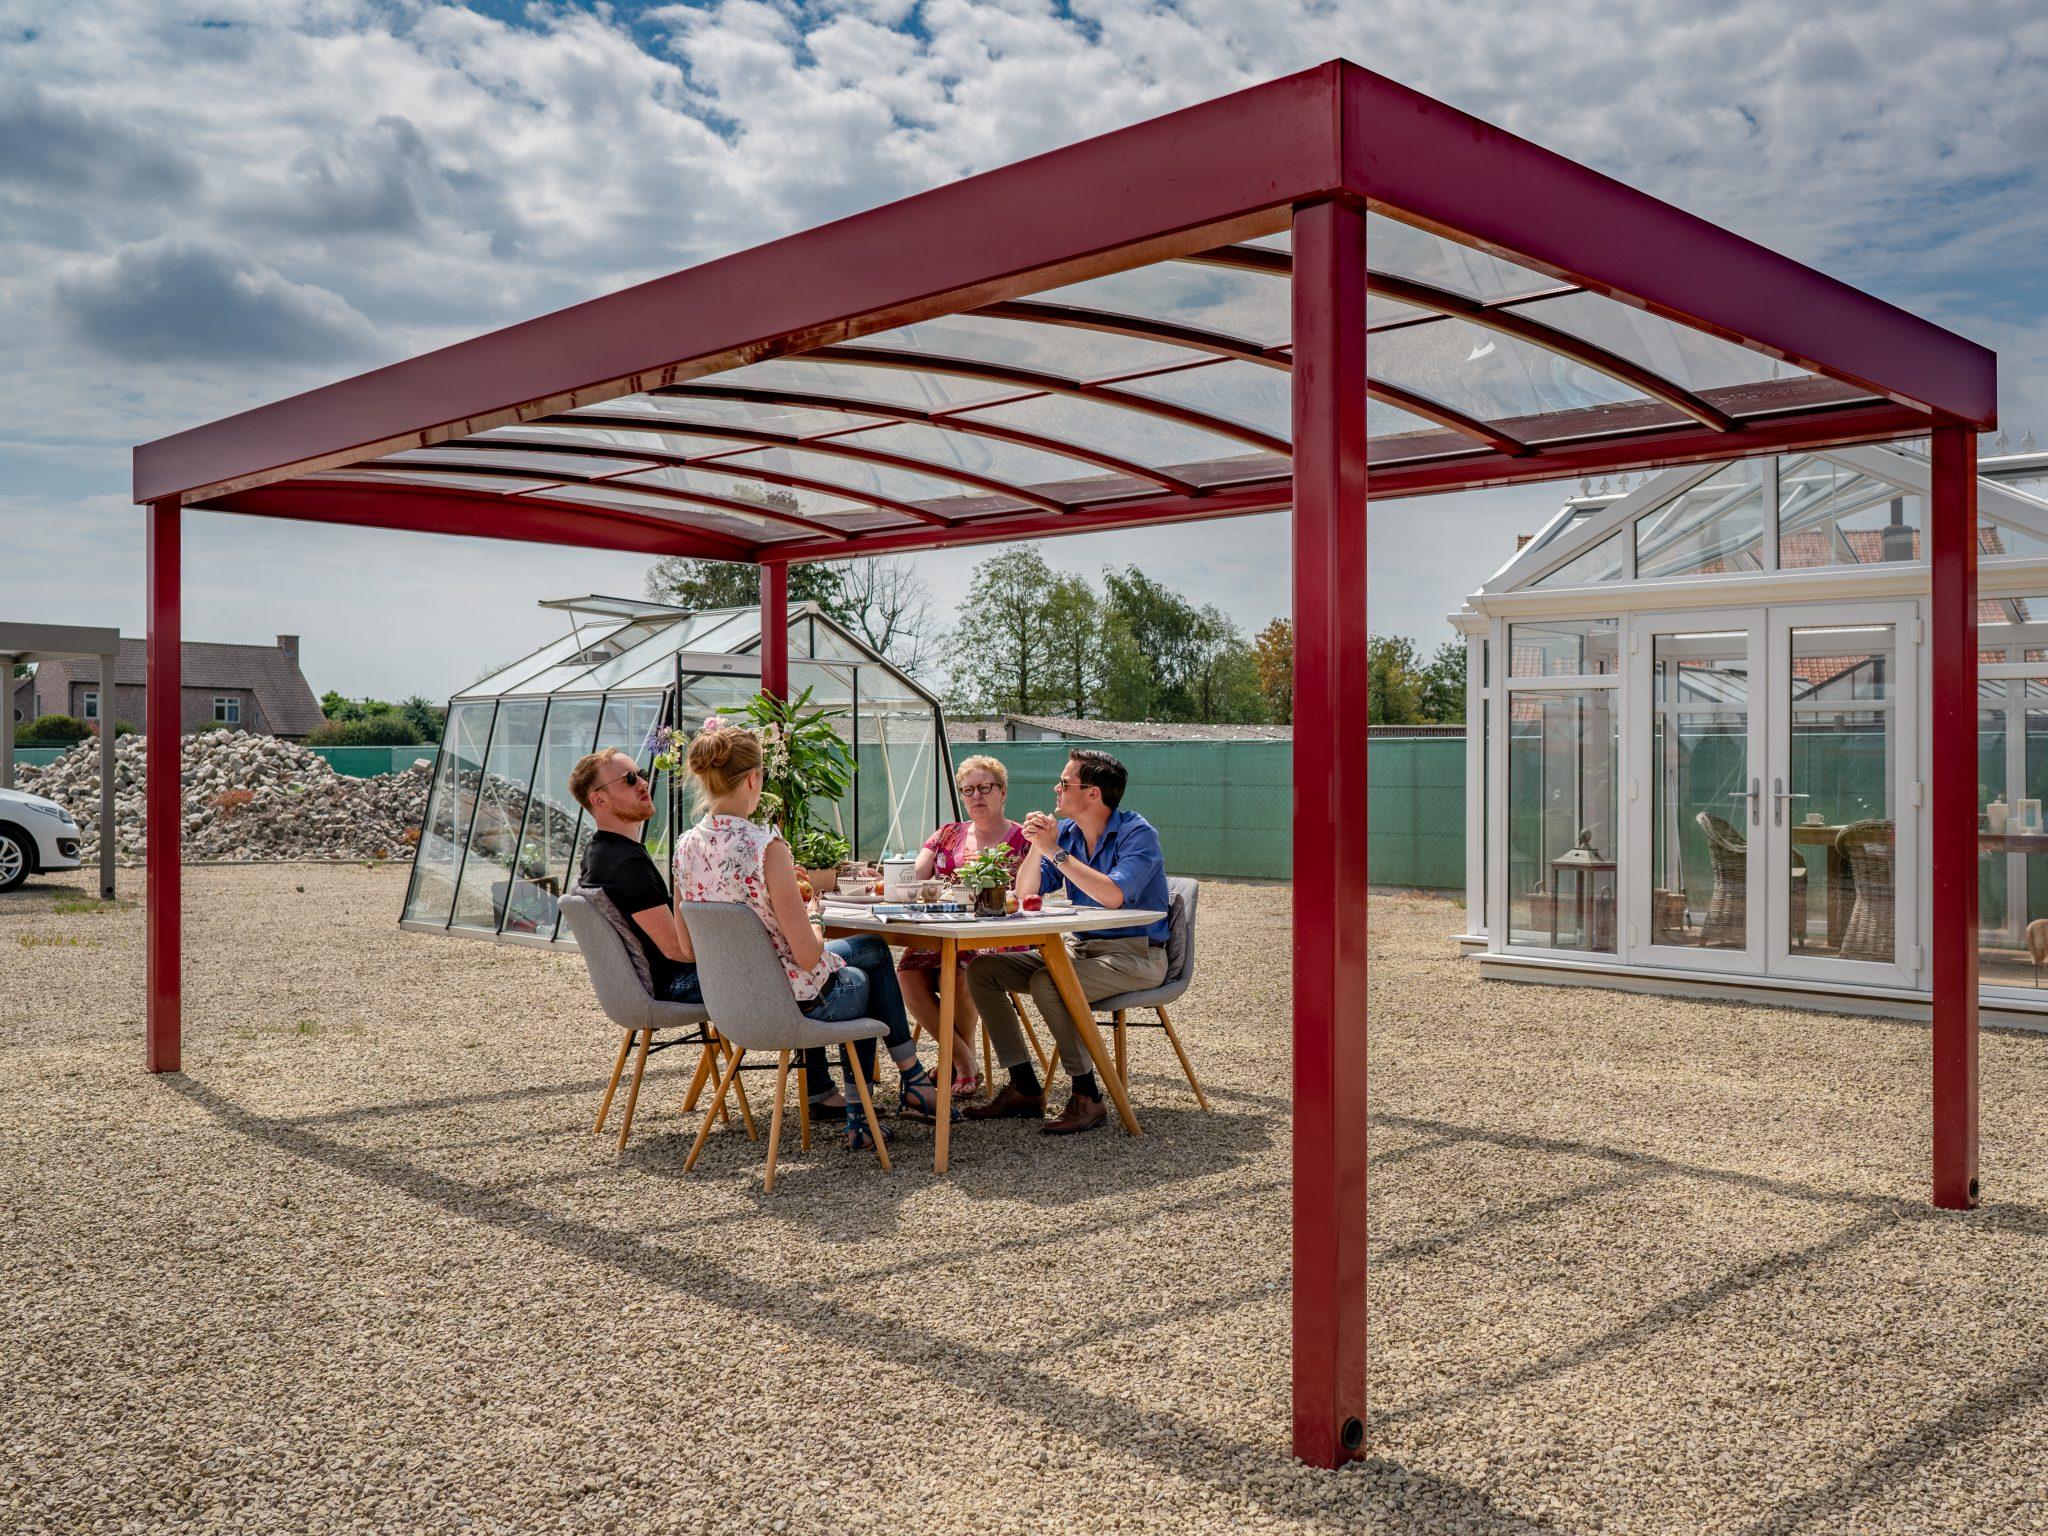 Carport ou Abris de Jardin Arc Designed| RAL 3004 | STR| Stockdeal | Nearly New